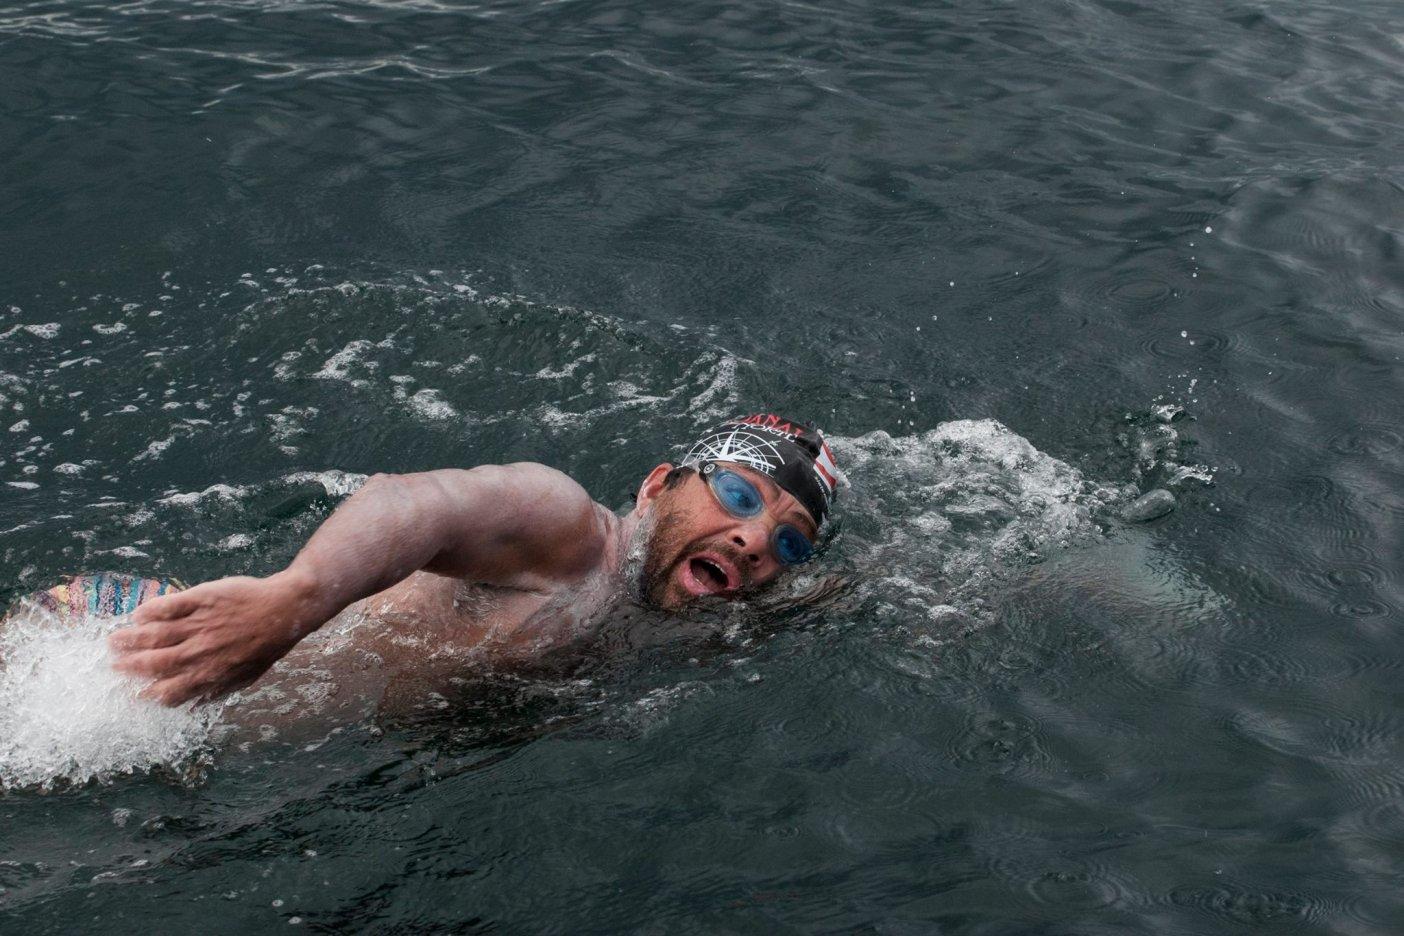 Felicita Peña Nieto a Antonio Argüelles, nadador de aguas profundas